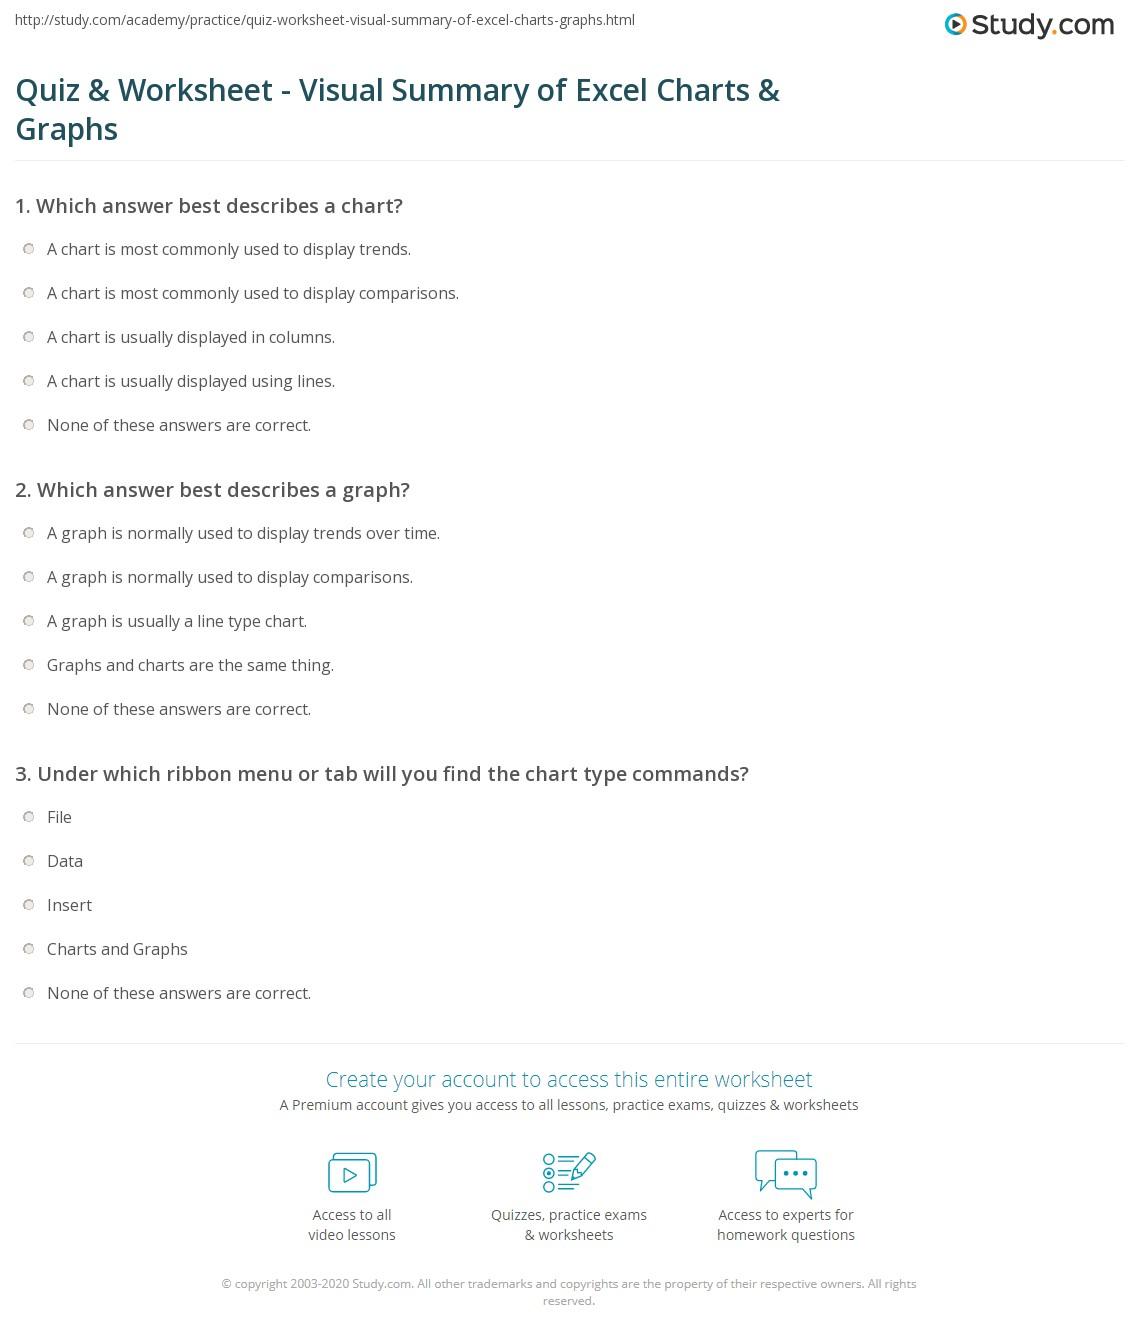 Quiz Worksheet Visual Summary Of Excel Charts Graphs Logic Diagram Print Summarizing Data Visually